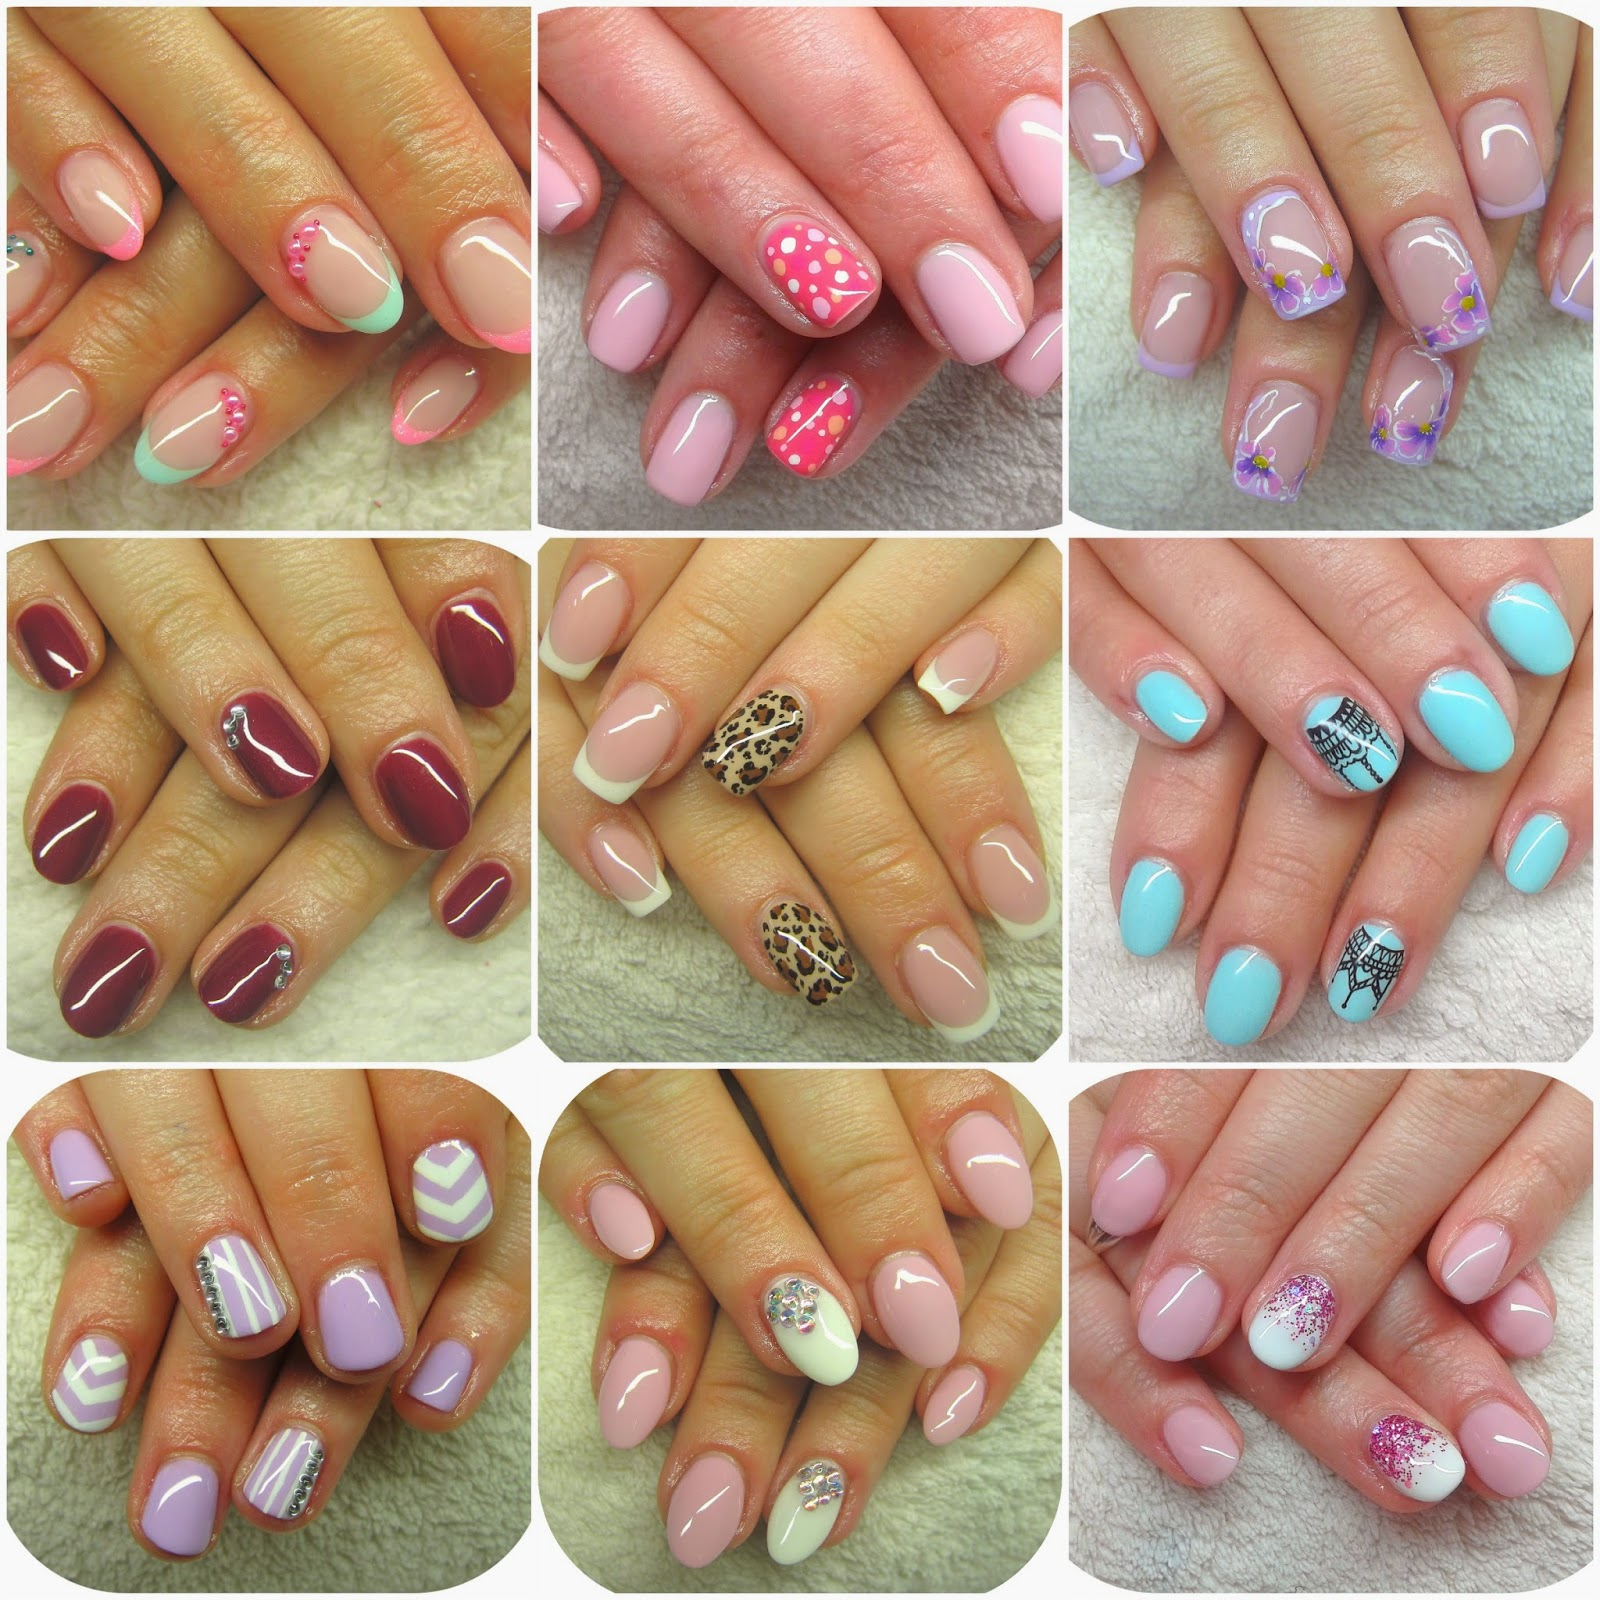 https://mosolypolc.wordpress.com/2015/04/14/beauty-10-legujabb-munkam/